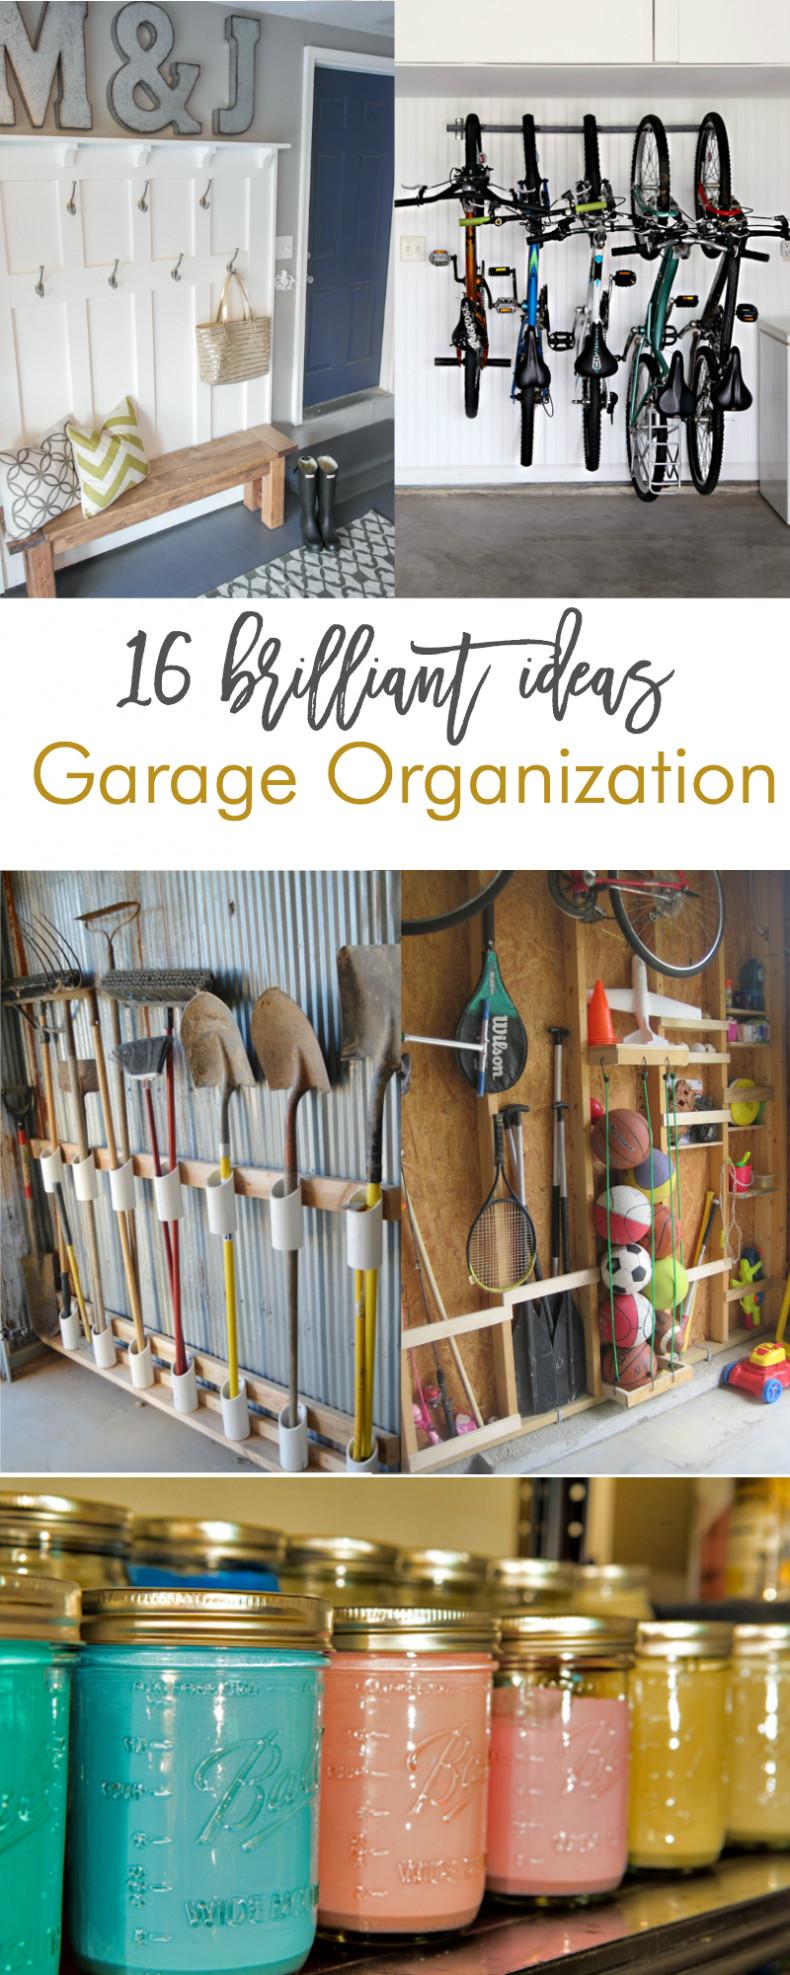 Garage Organization Ideas  16 Brilliant DIY Garage Organization Ideas